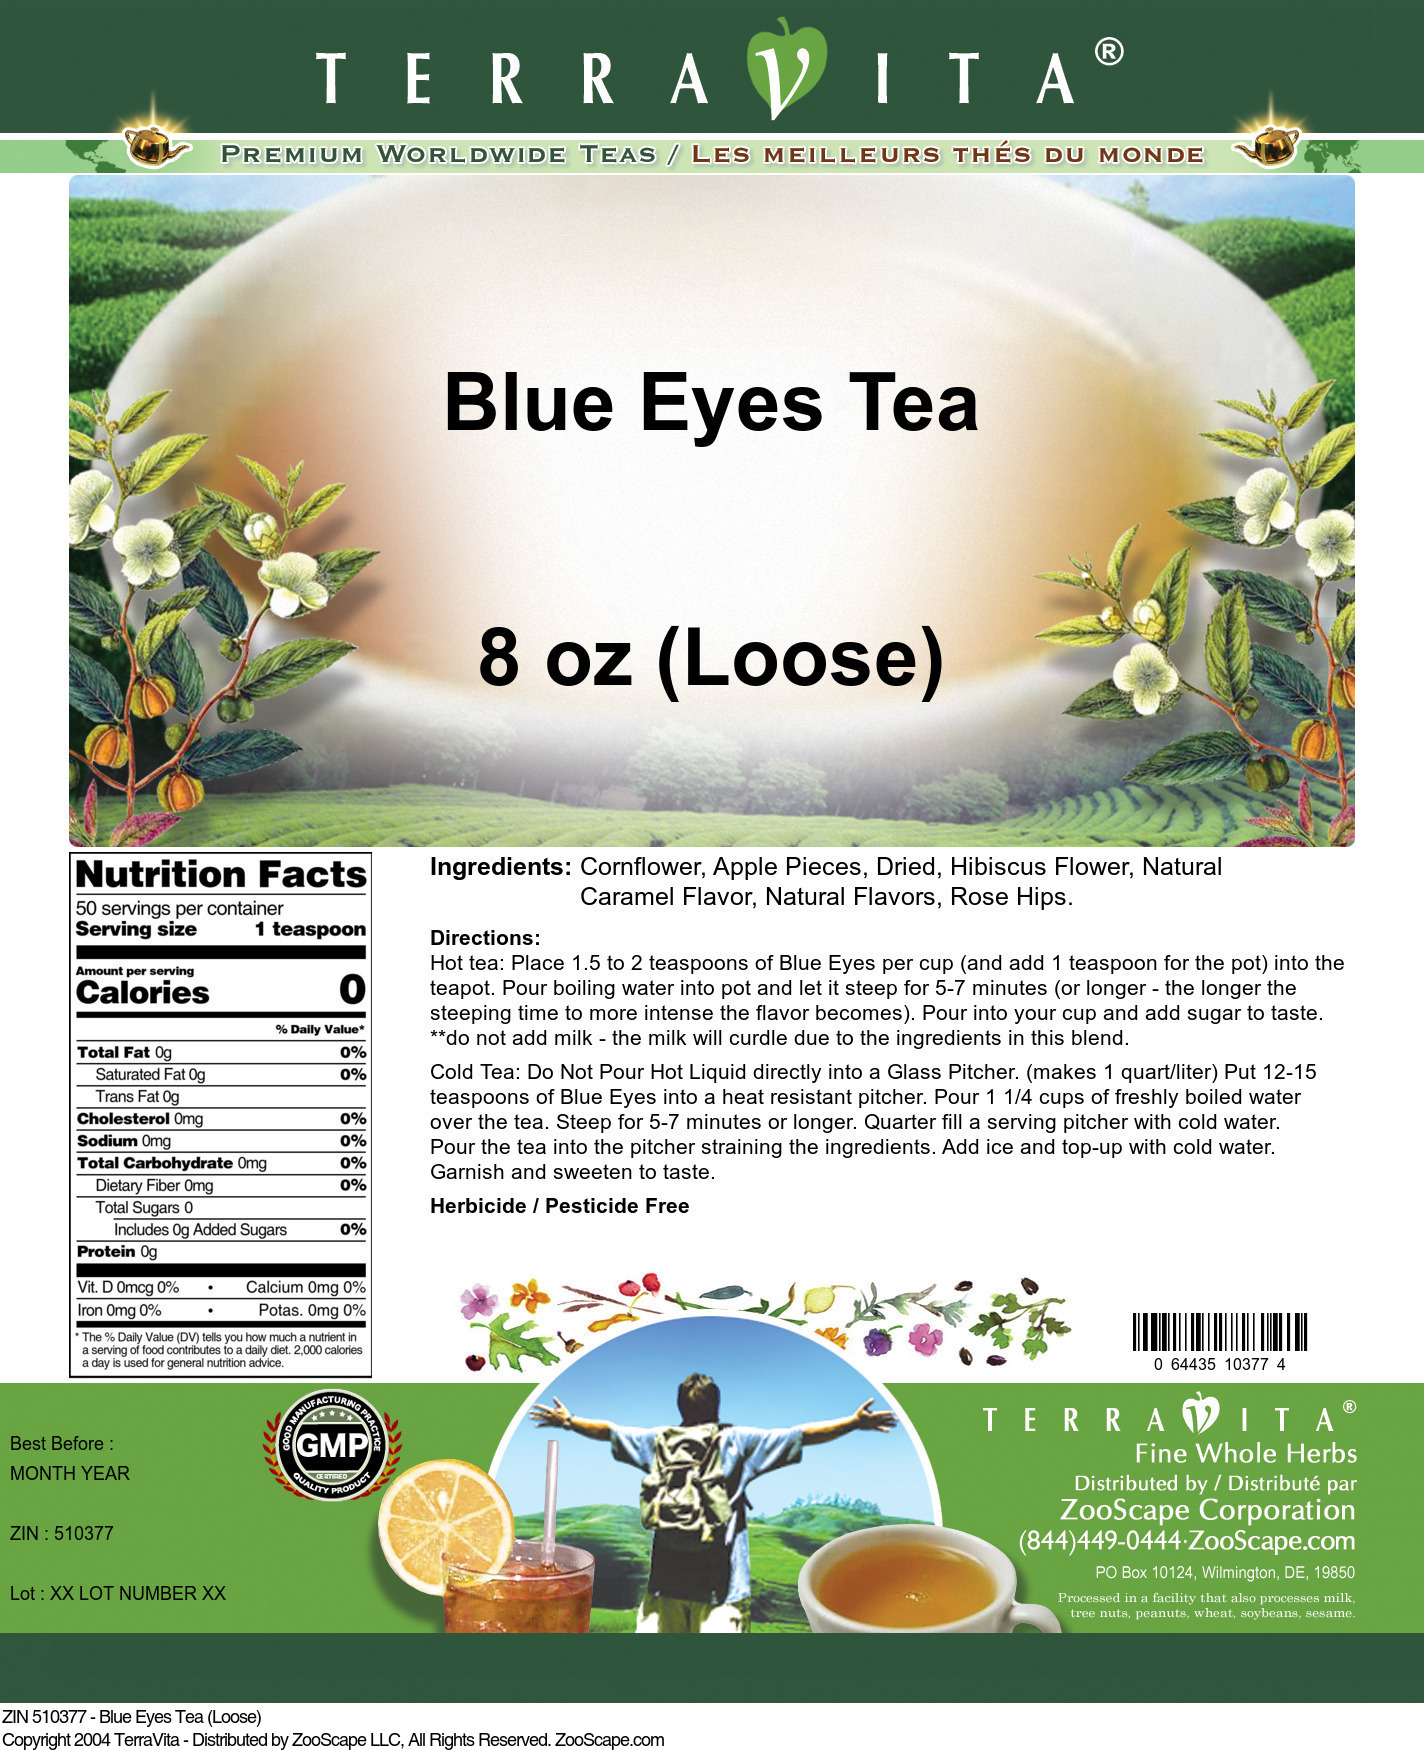 Blue Eyes Tea (Loose)